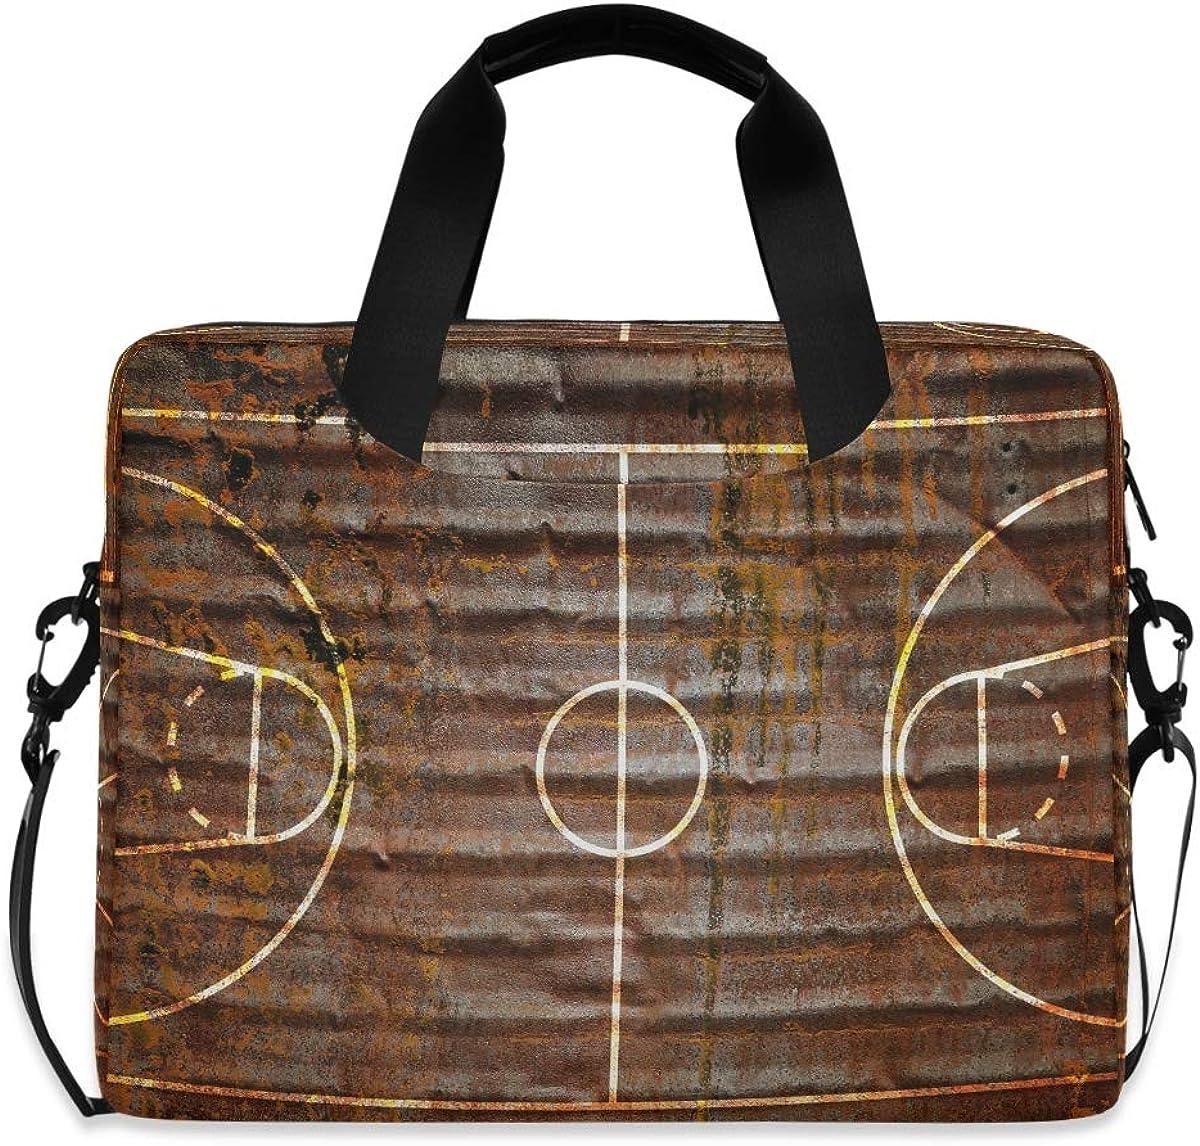 LELEGO Sport Basketball Court Bag Cheap SALE Start Shoulder Animer and price revision Car Laptop